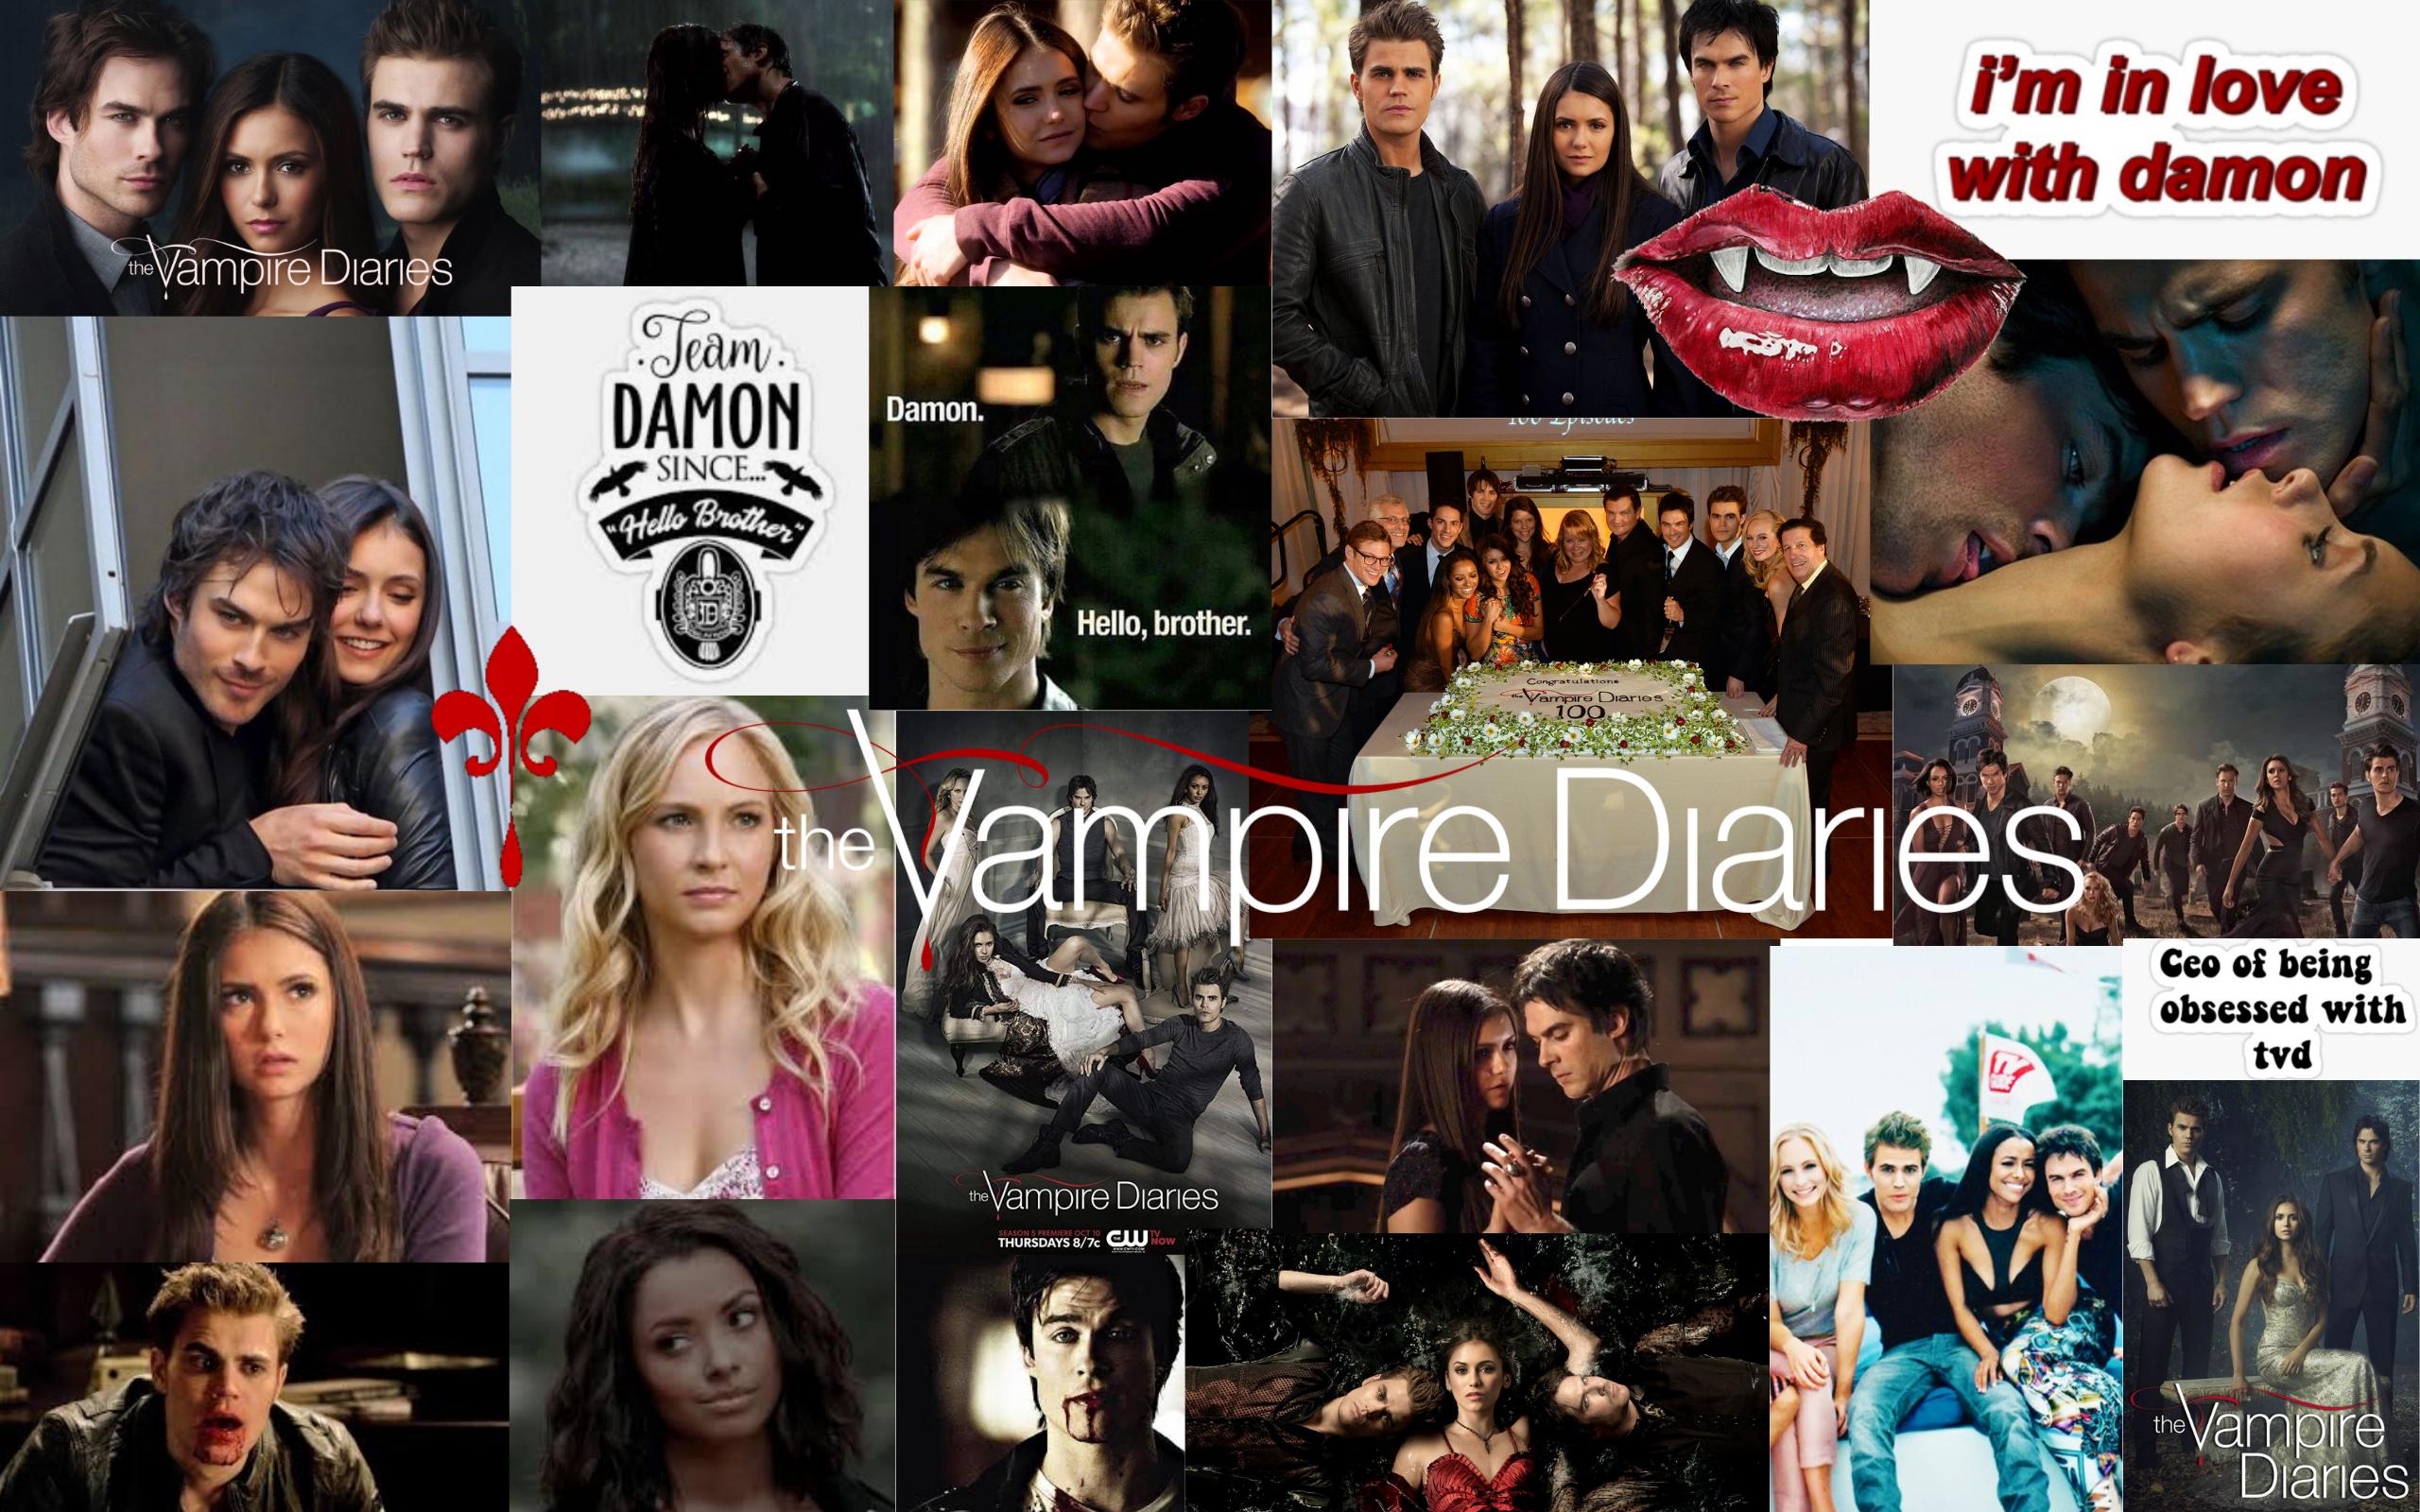 Tvd Wallpaper Laptop Vampire Diaries Wallpaper Vampire Diaries Damon Vampire Diaries